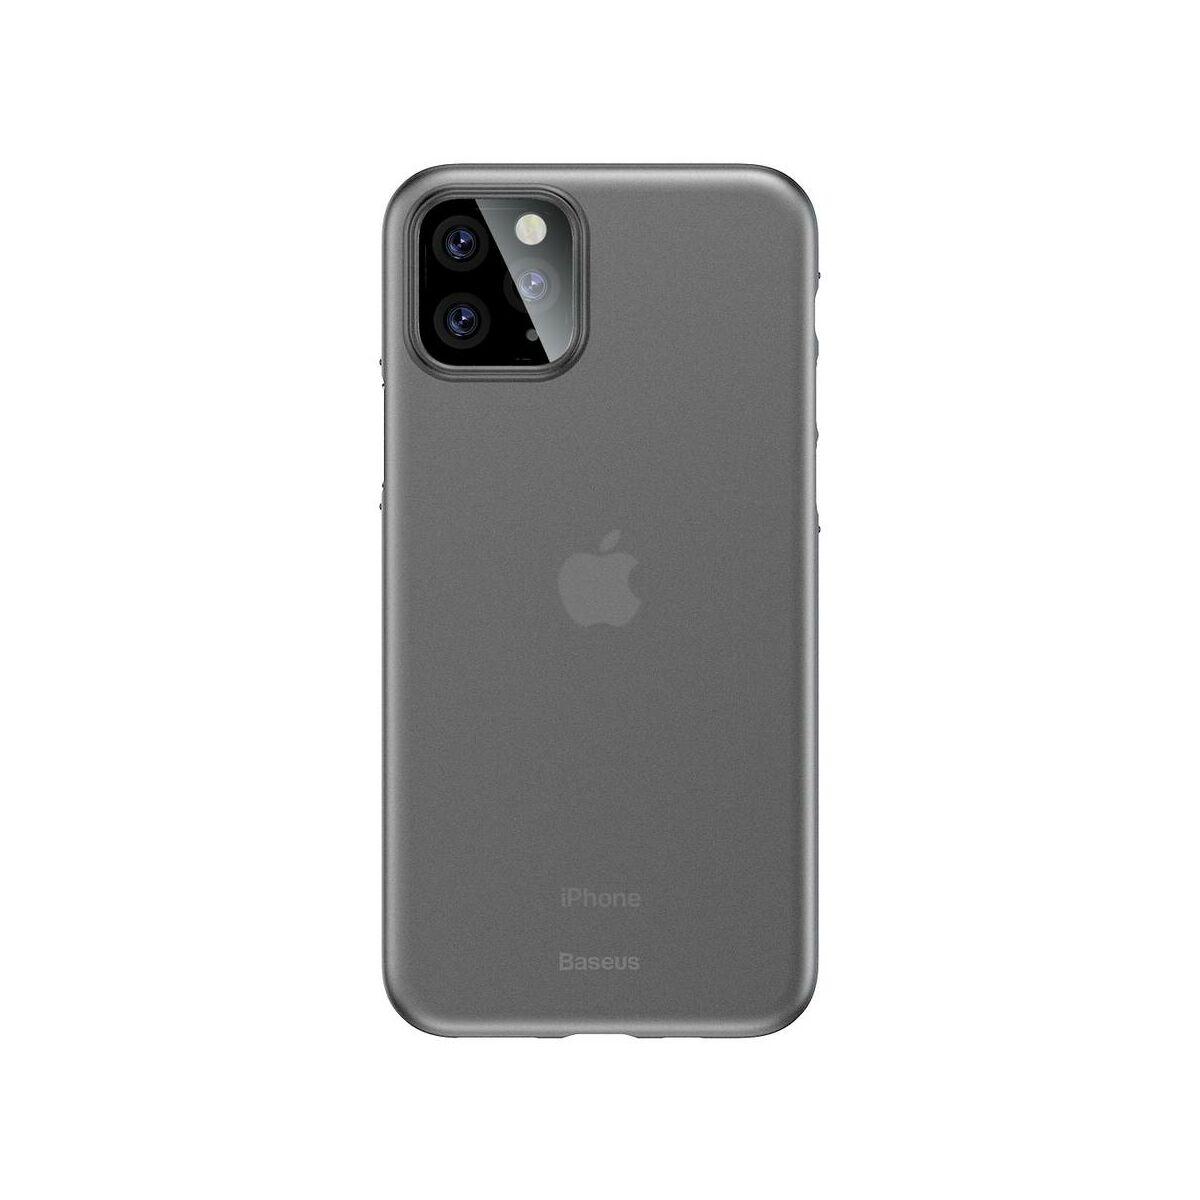 Baseus iPhone 11 Pro tok, Wing, fehér (WIAPIPH58S-02)